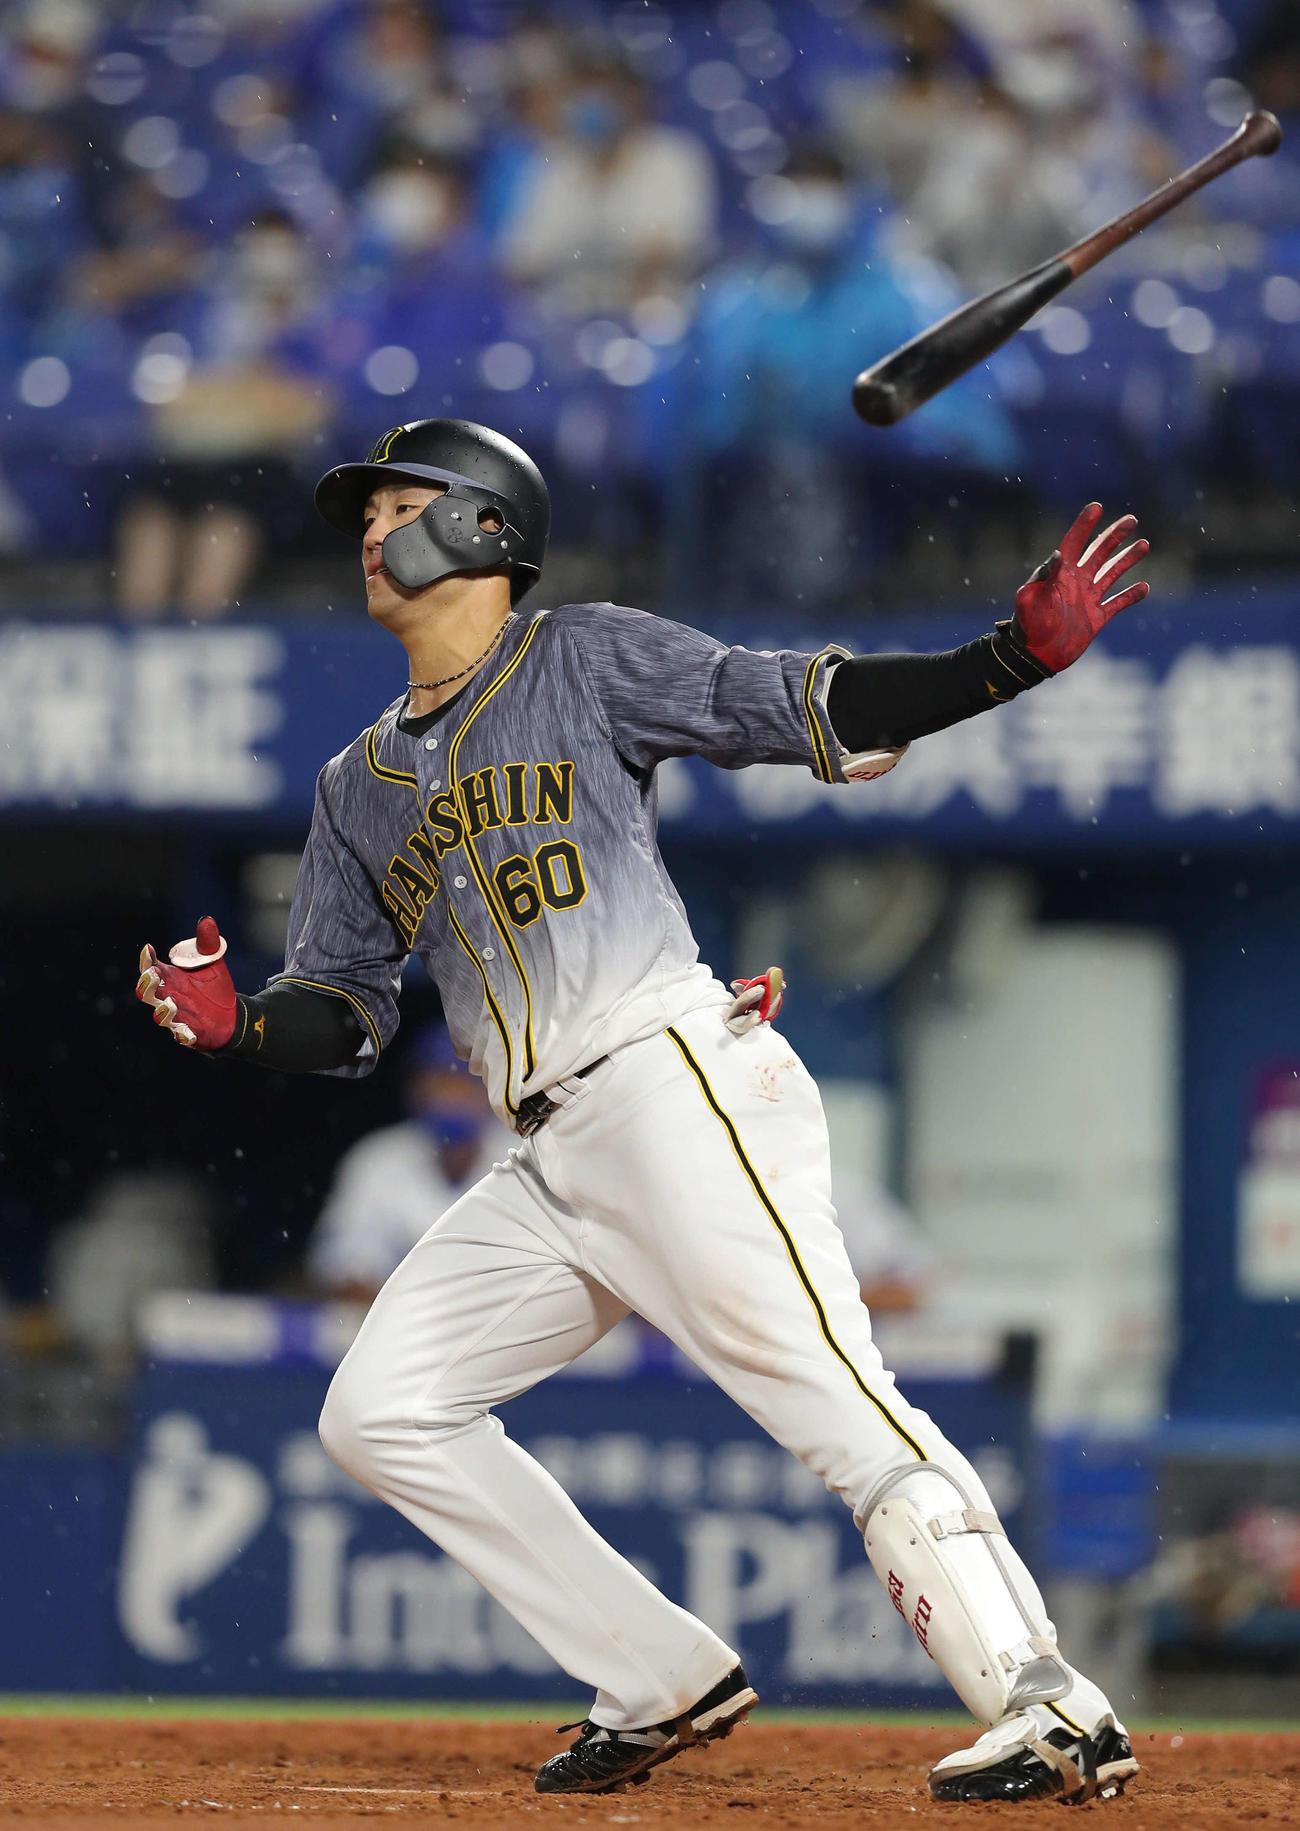 DeNA対阪神 4回表阪神2死一、二塁、左越え逆転3点本塁打を放つ中谷(撮影・前田充)